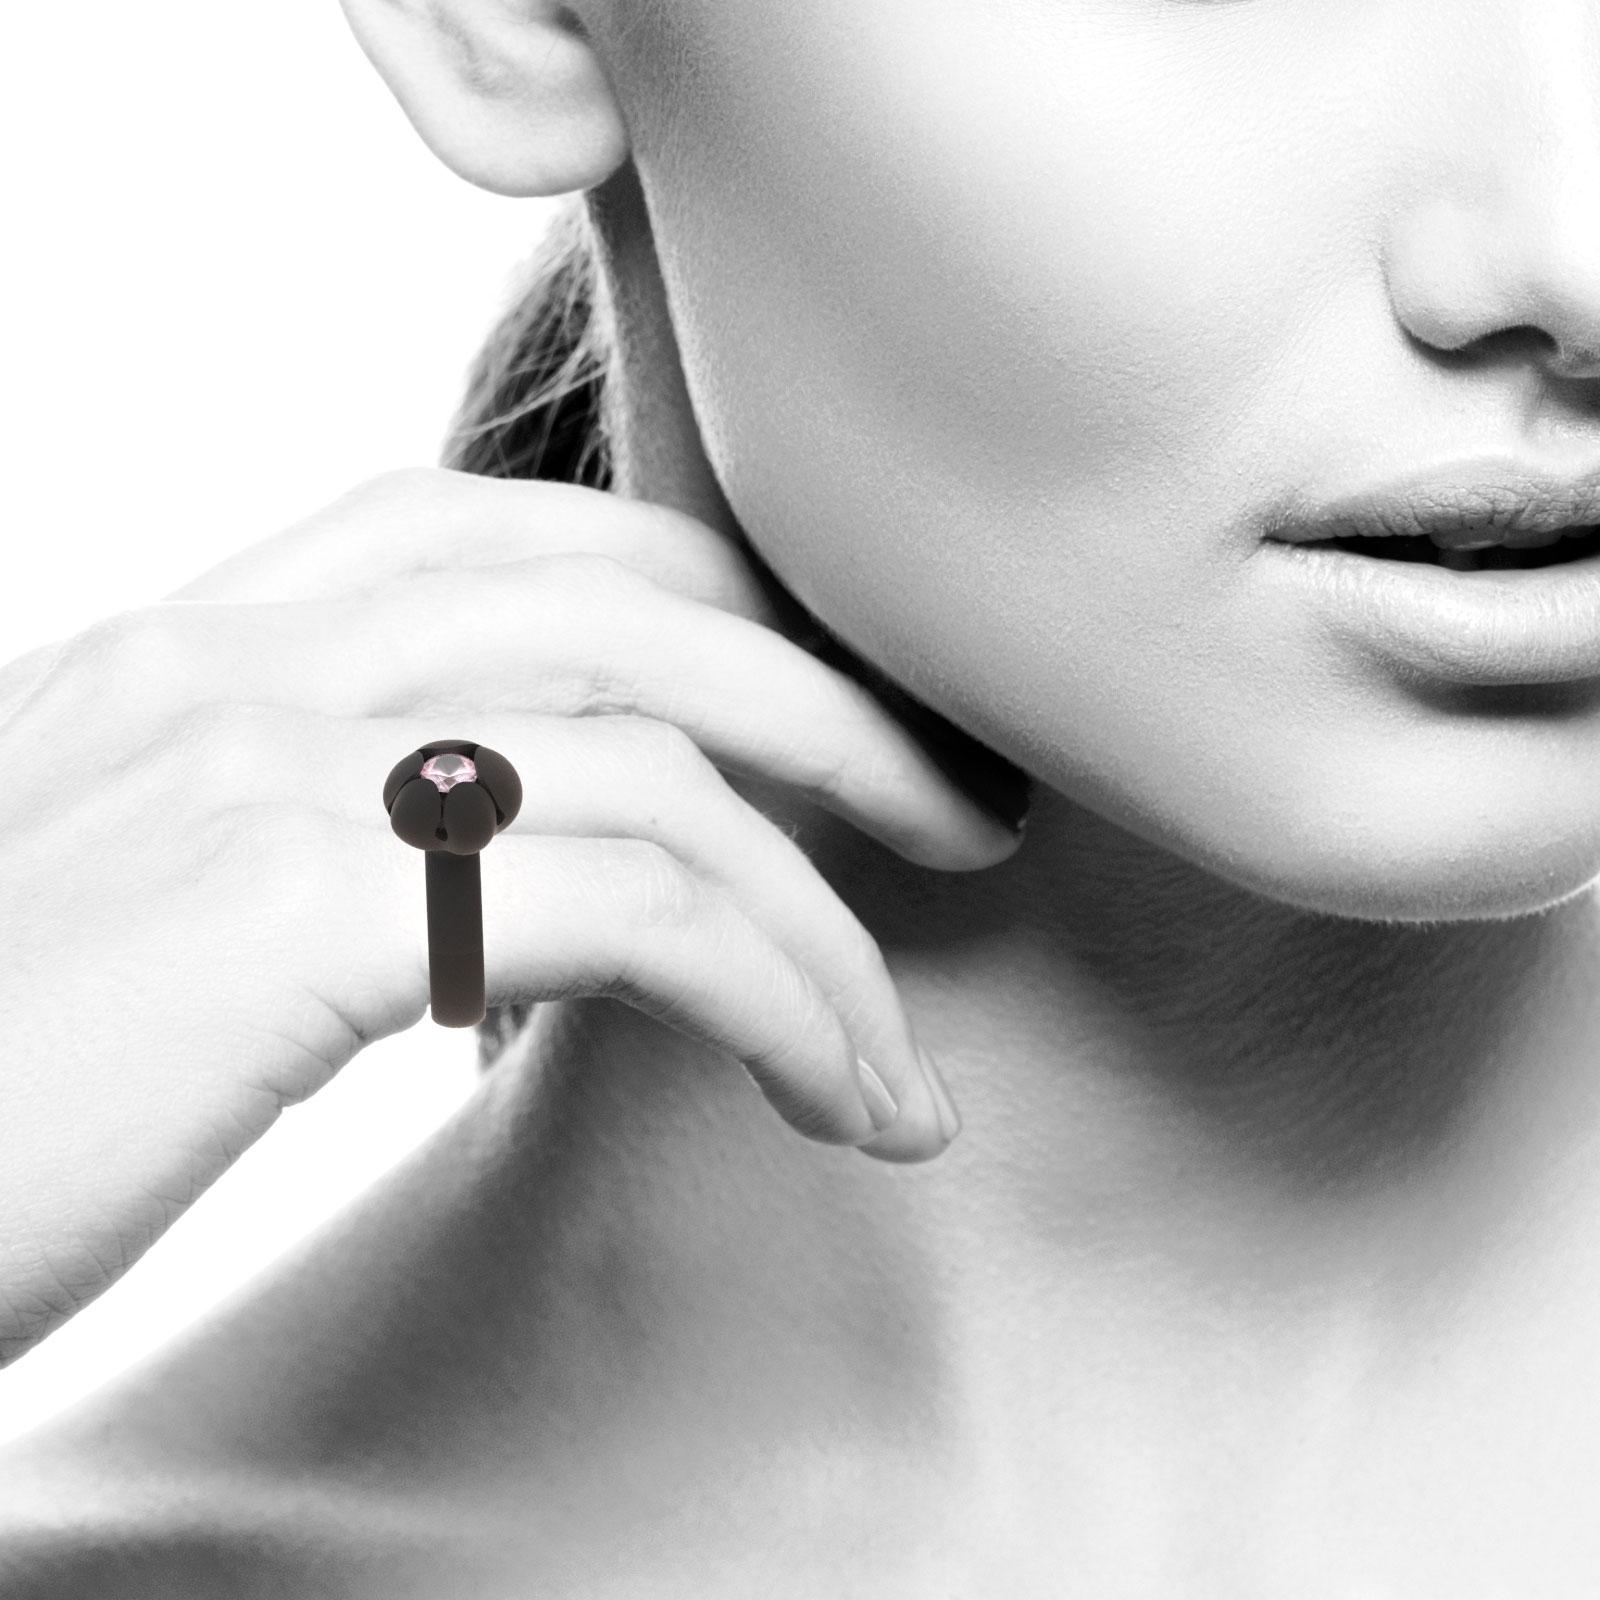 Bud Ring, 6mm Amethyst